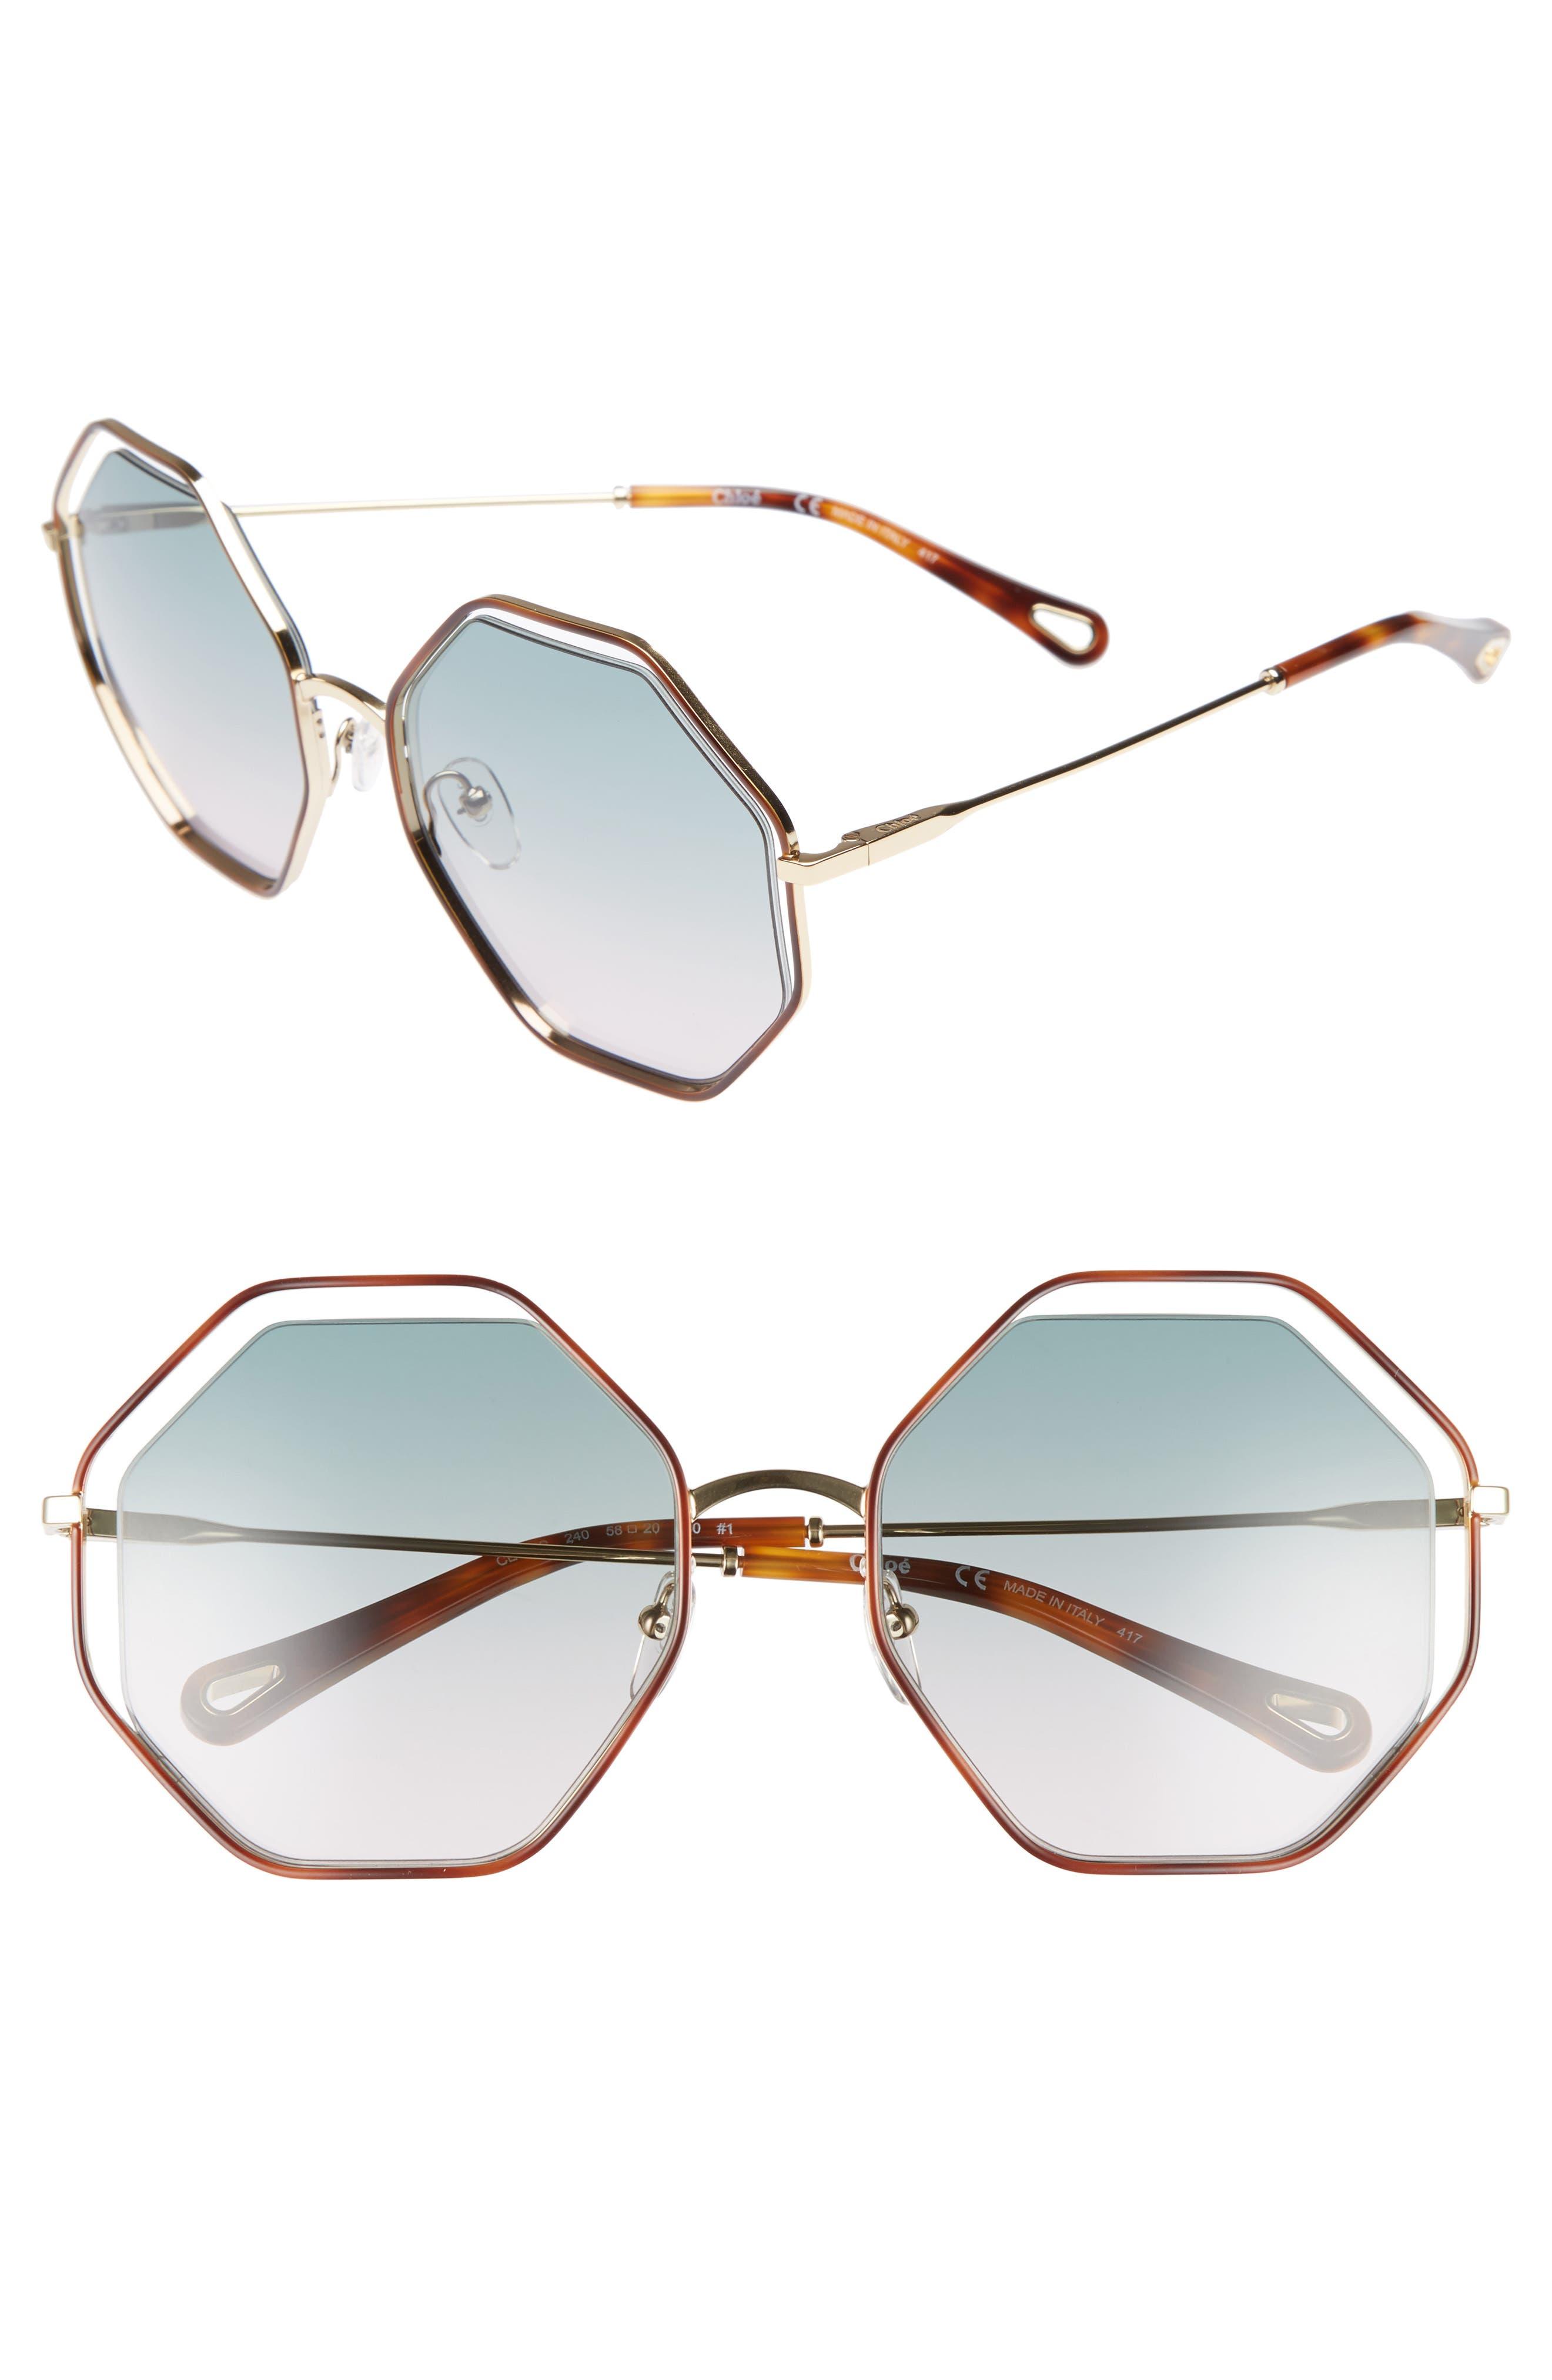 58mm Octagonal Halo Lens Sunglasses,                             Main thumbnail 1, color,                             Havana/ Green Rose